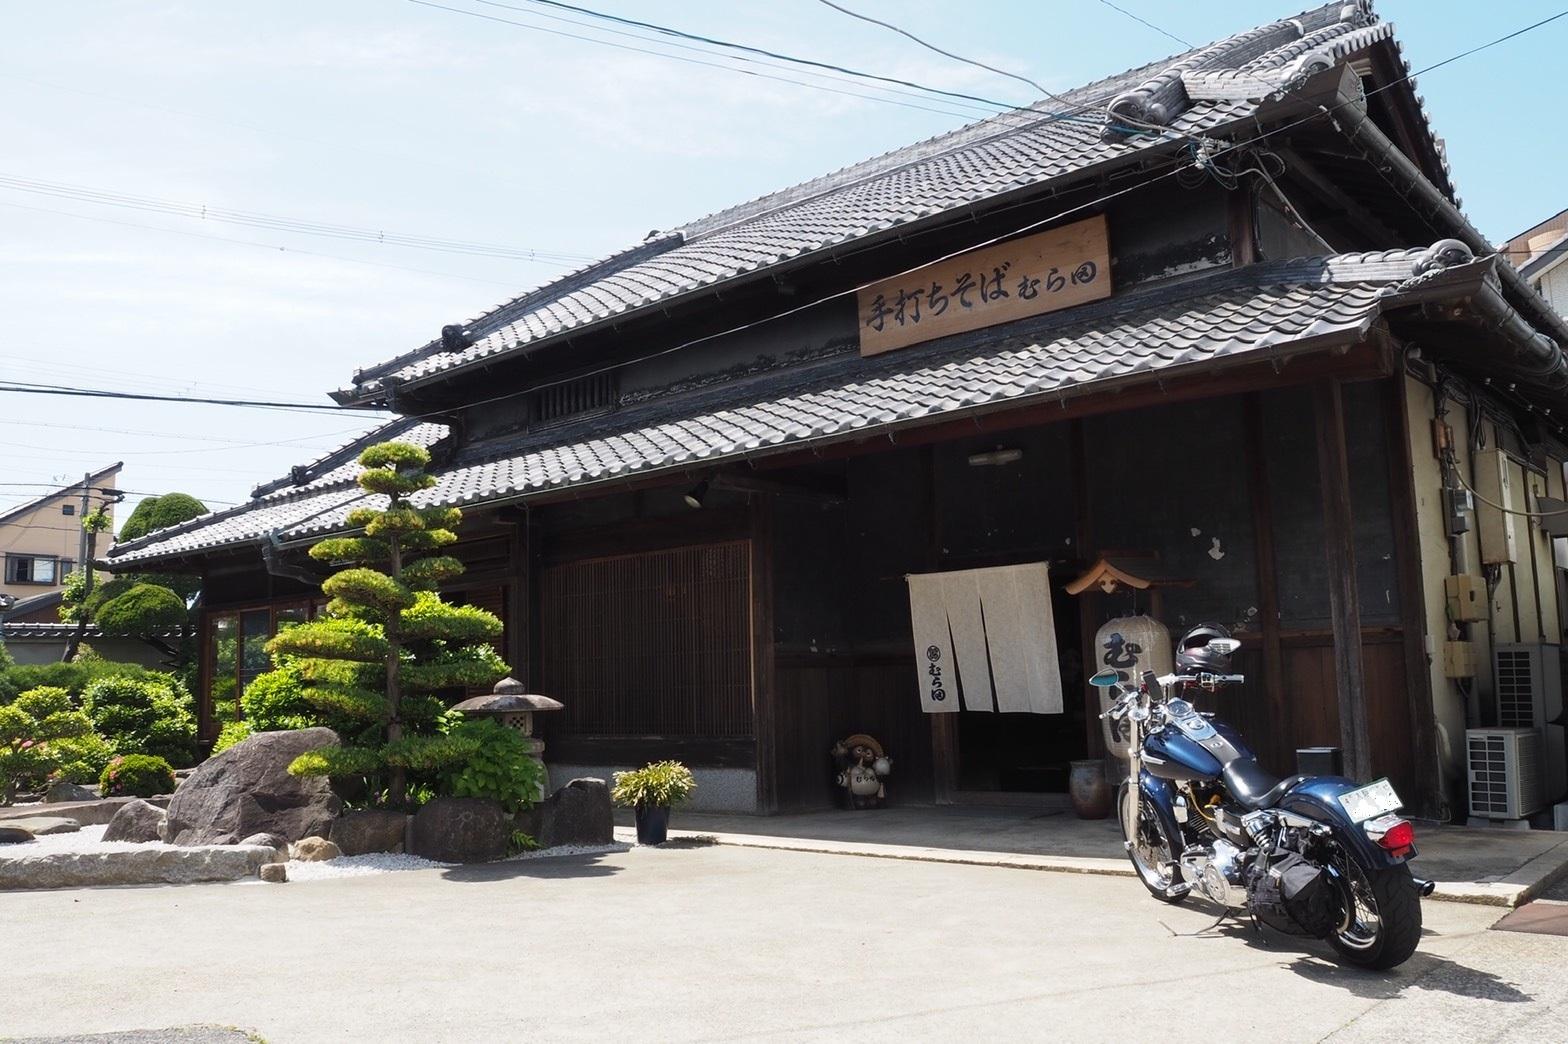 harleydavidson-motorcycle-touring-blog-osaka-minamikawachi-soba-murata.jpg